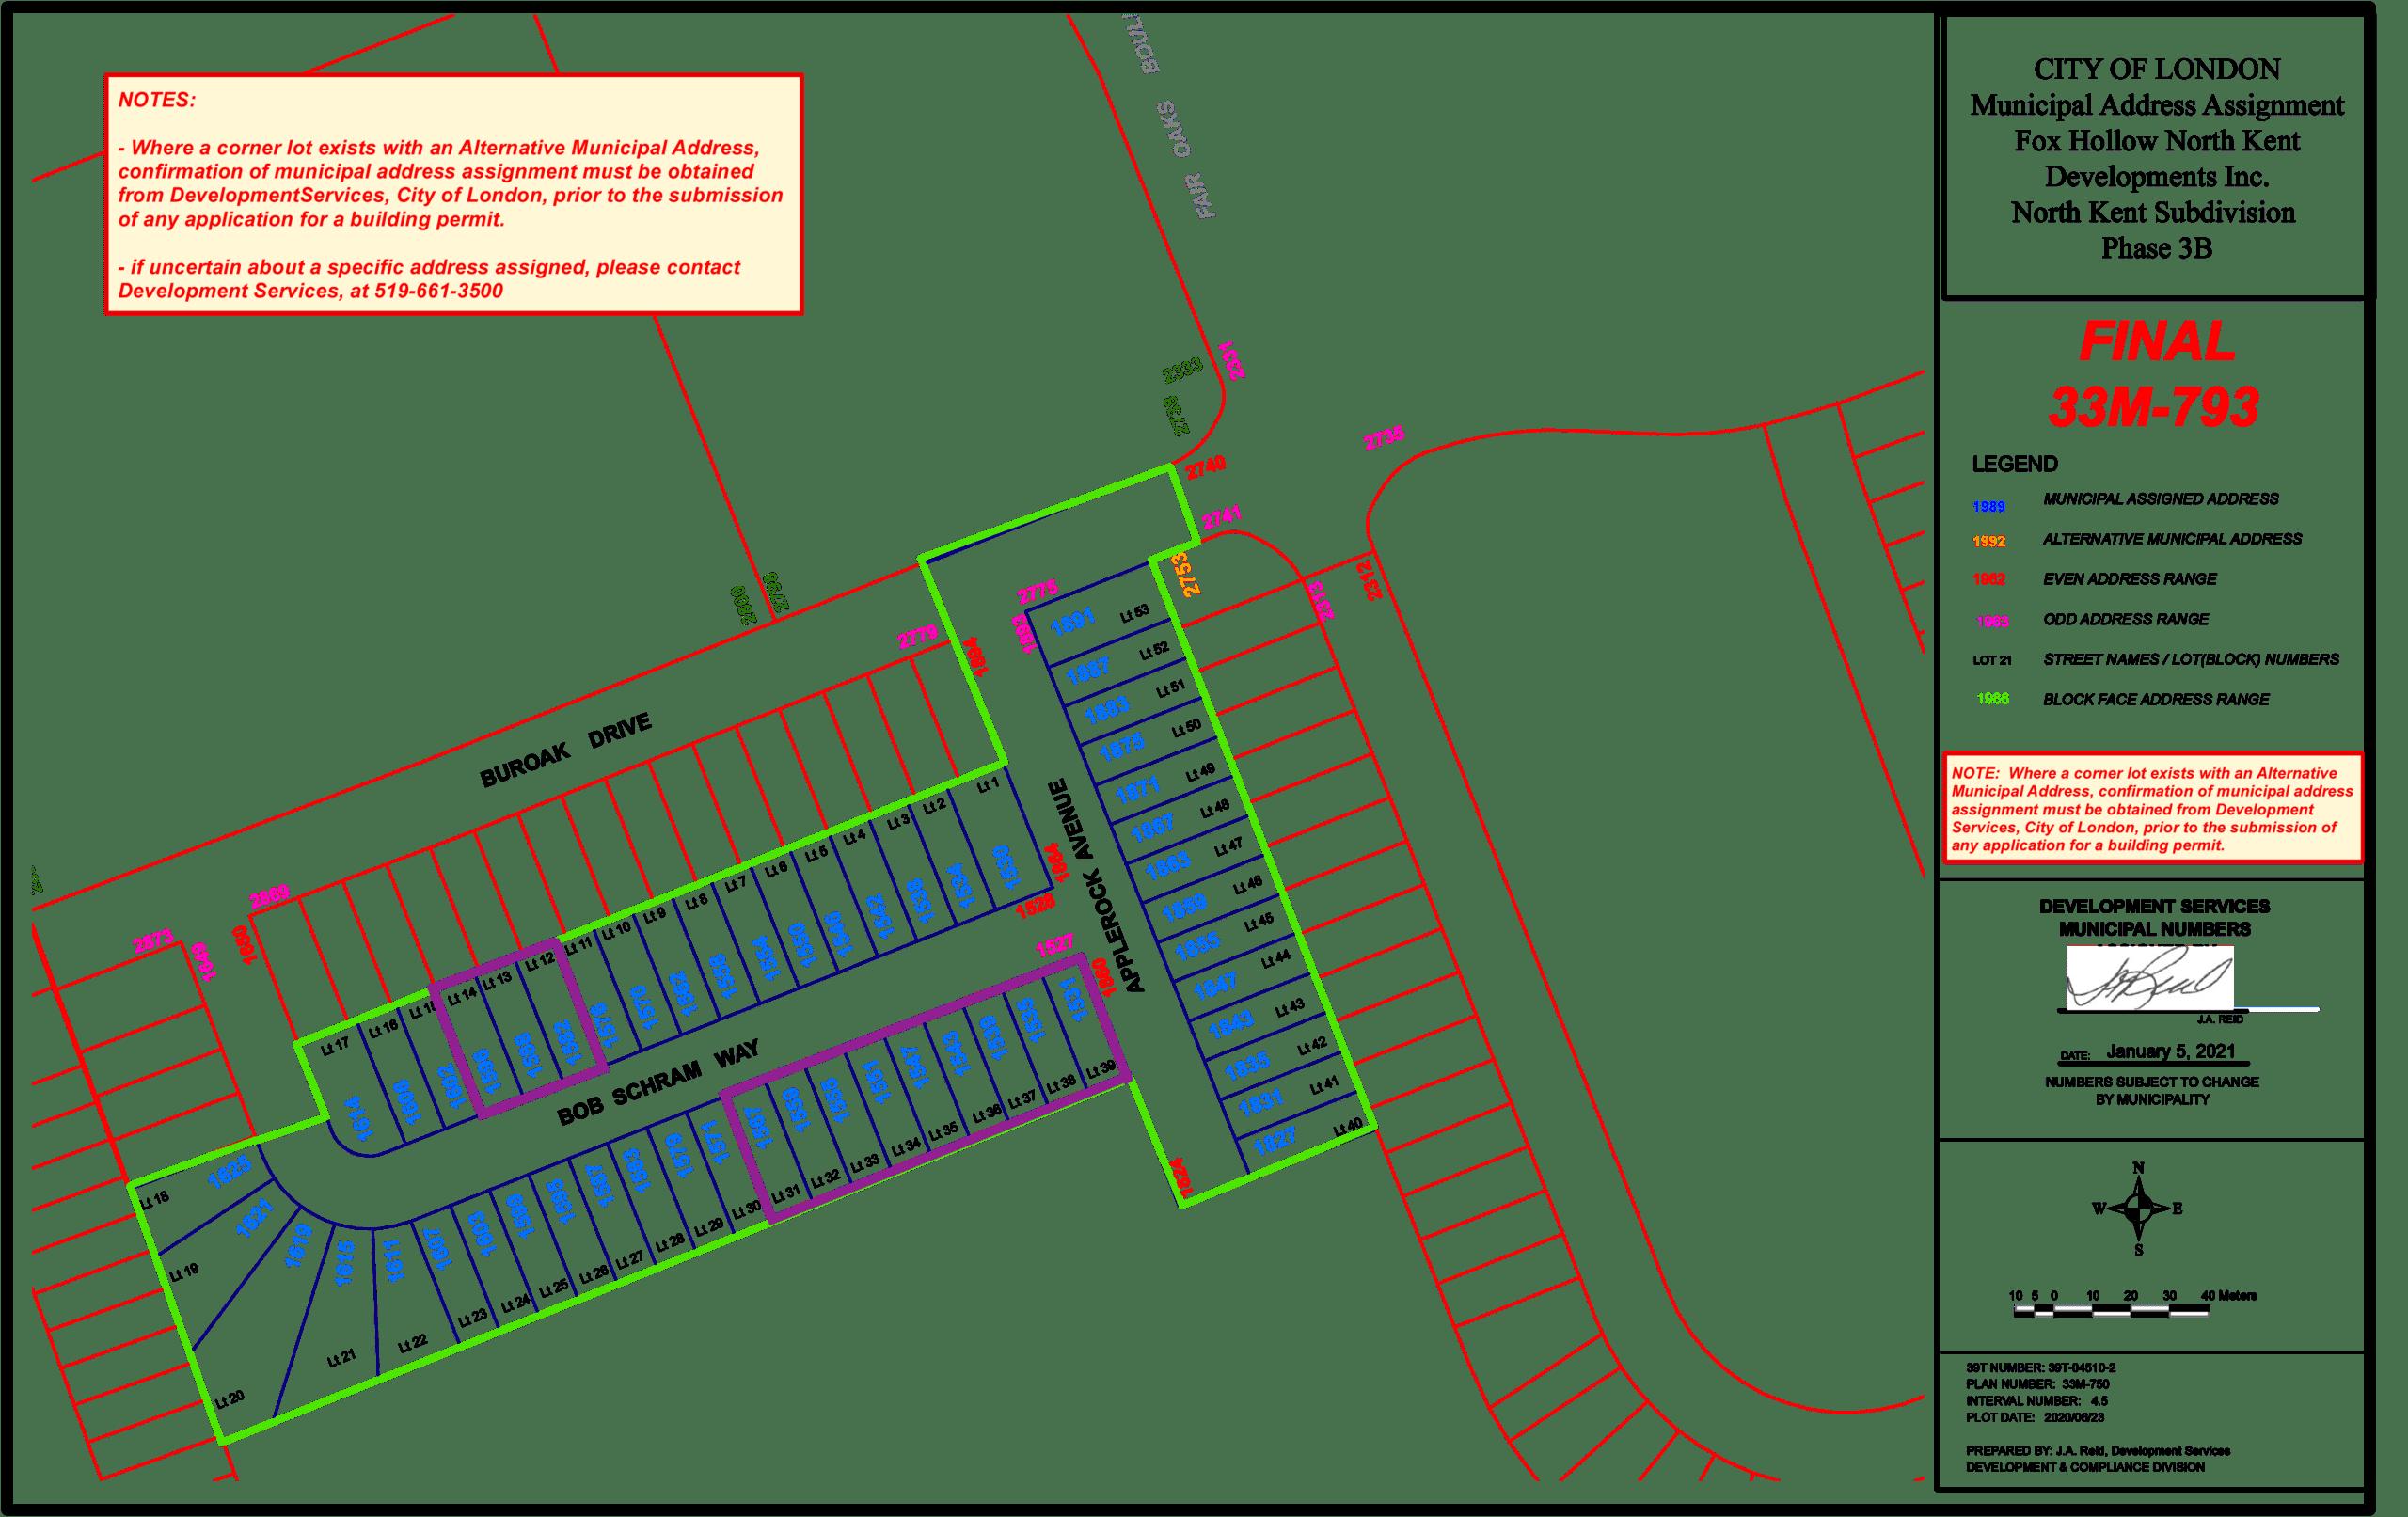 PHASE 8 SUNLIGHT MAP